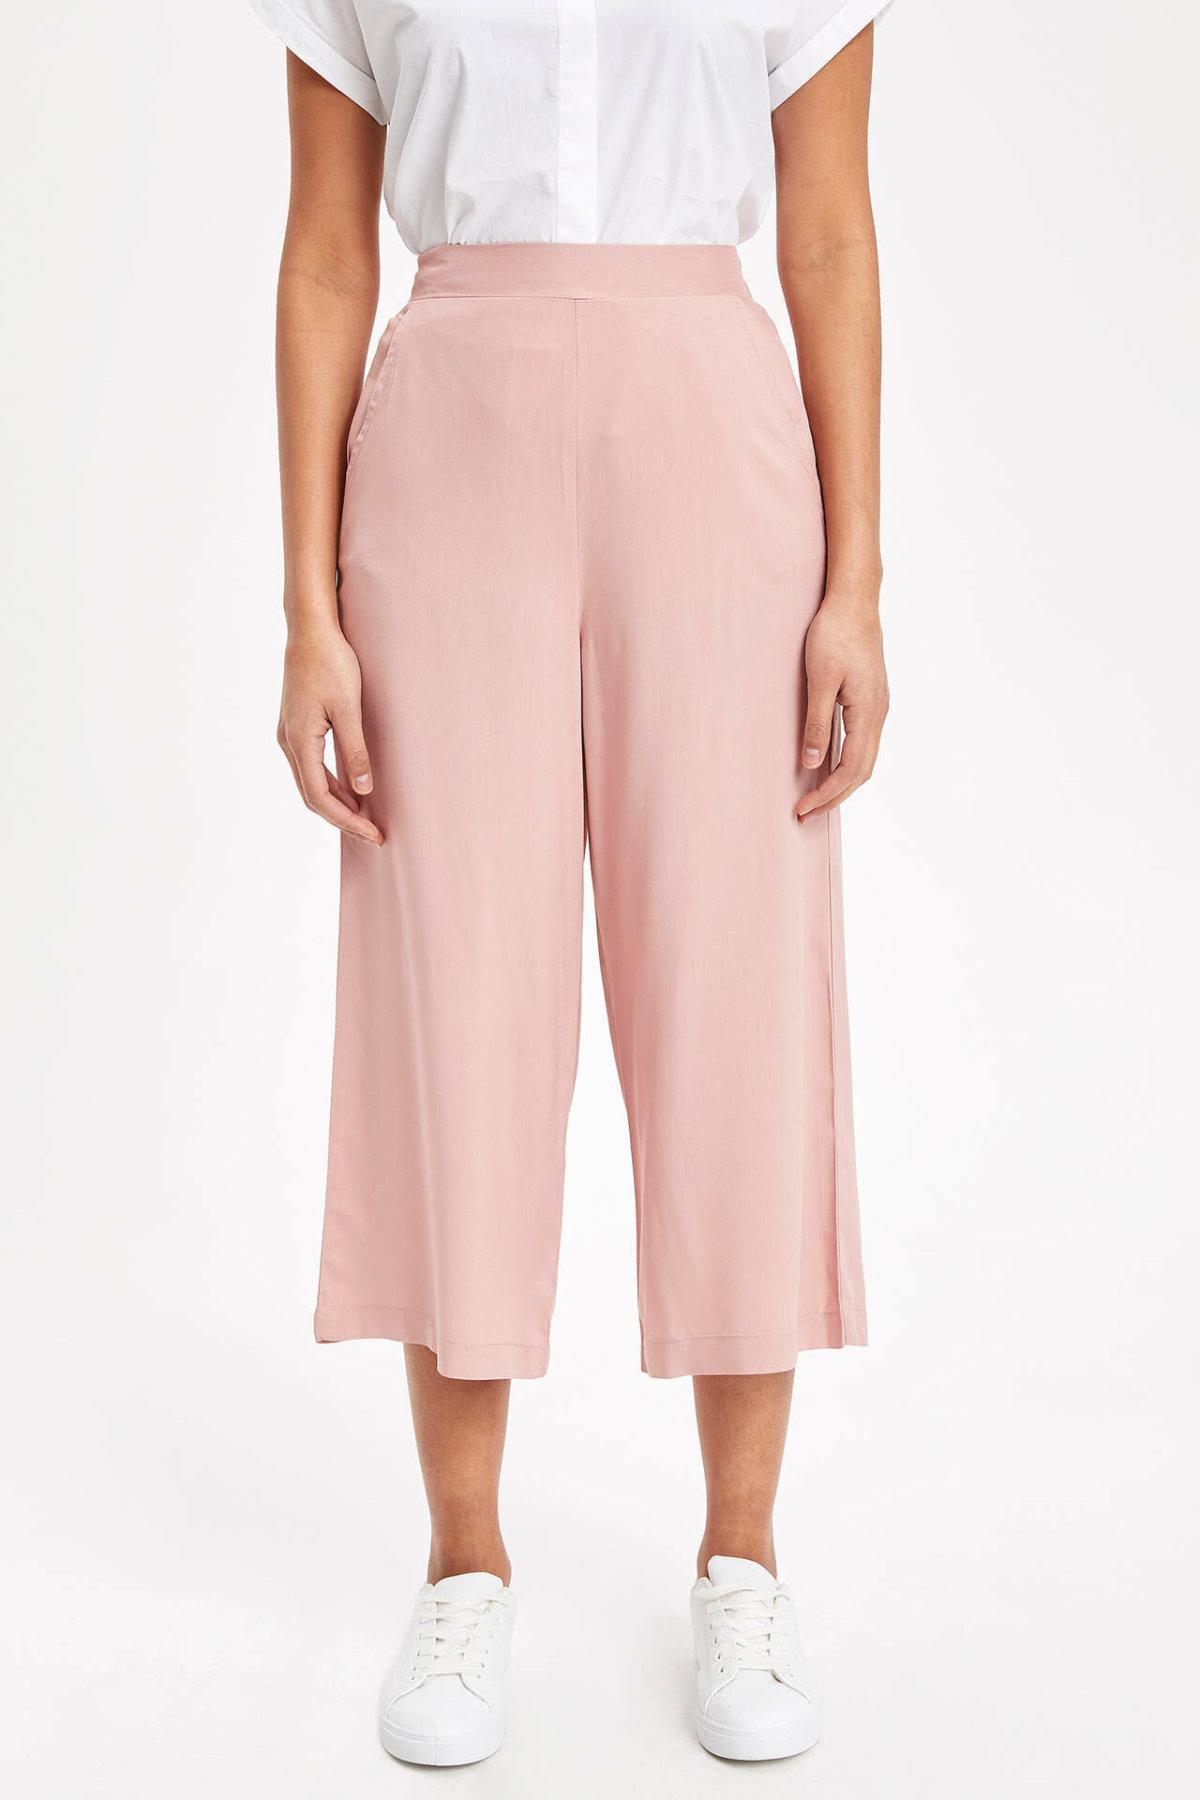 DeFacto Woman Summer Spring Wide-leg Pants Pink Black Color Women Loose Pants Casual Bottoms Female Trousers-K7379AZ19SM